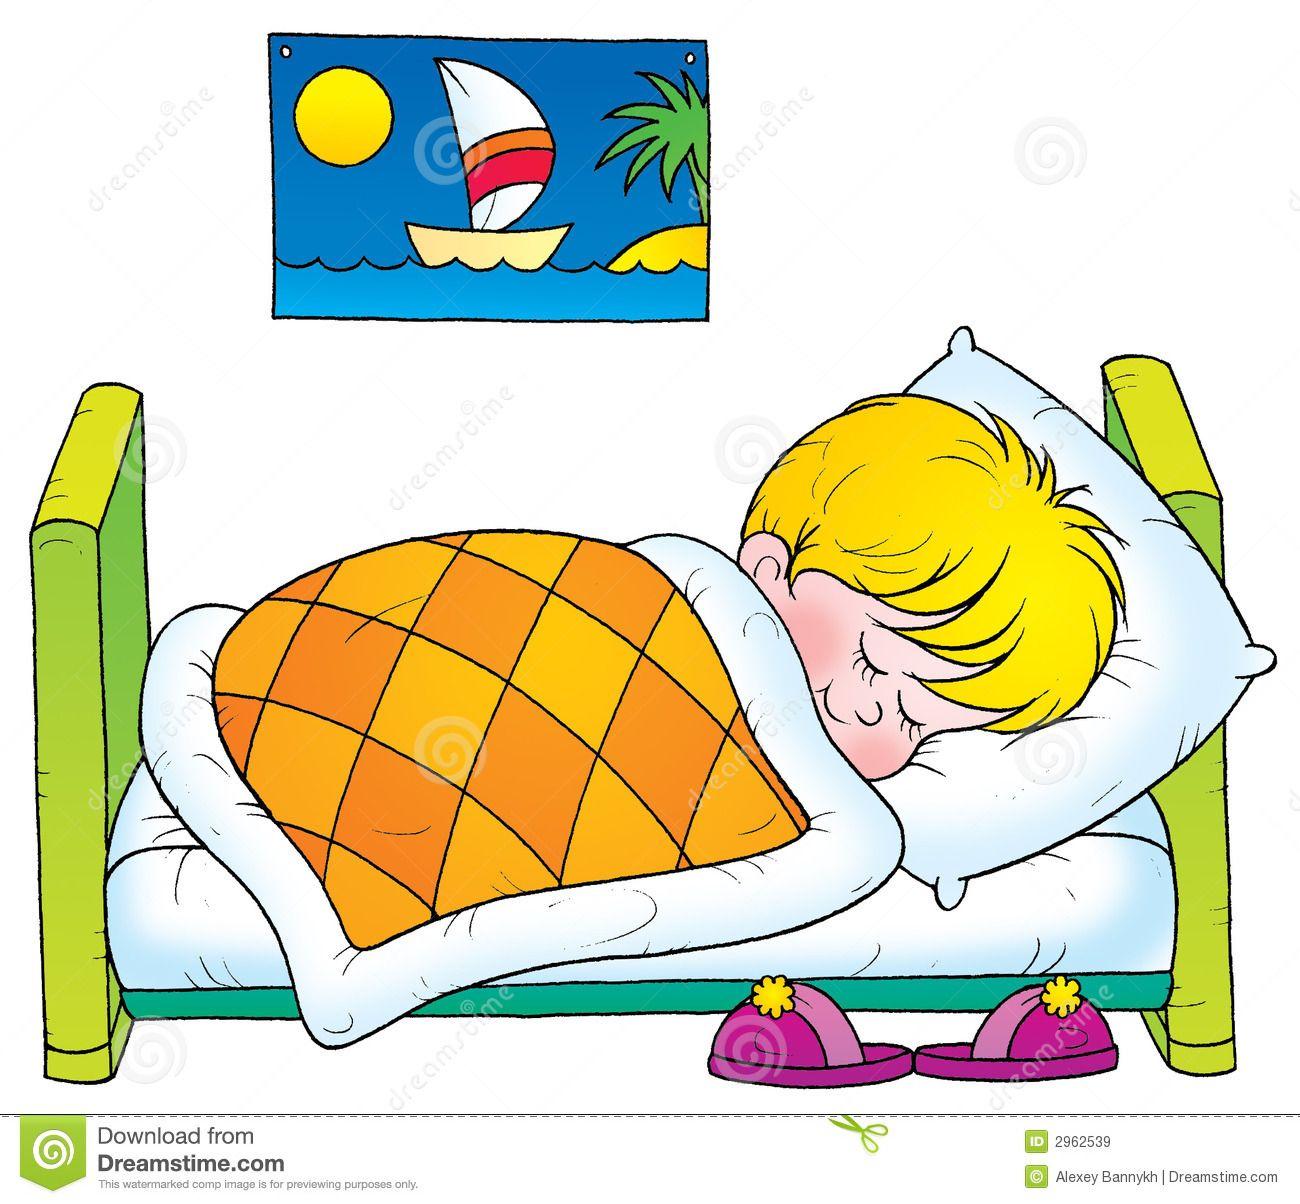 Best Of Child In Bed Clip Art Good Sleep Kids Sleep Healthy